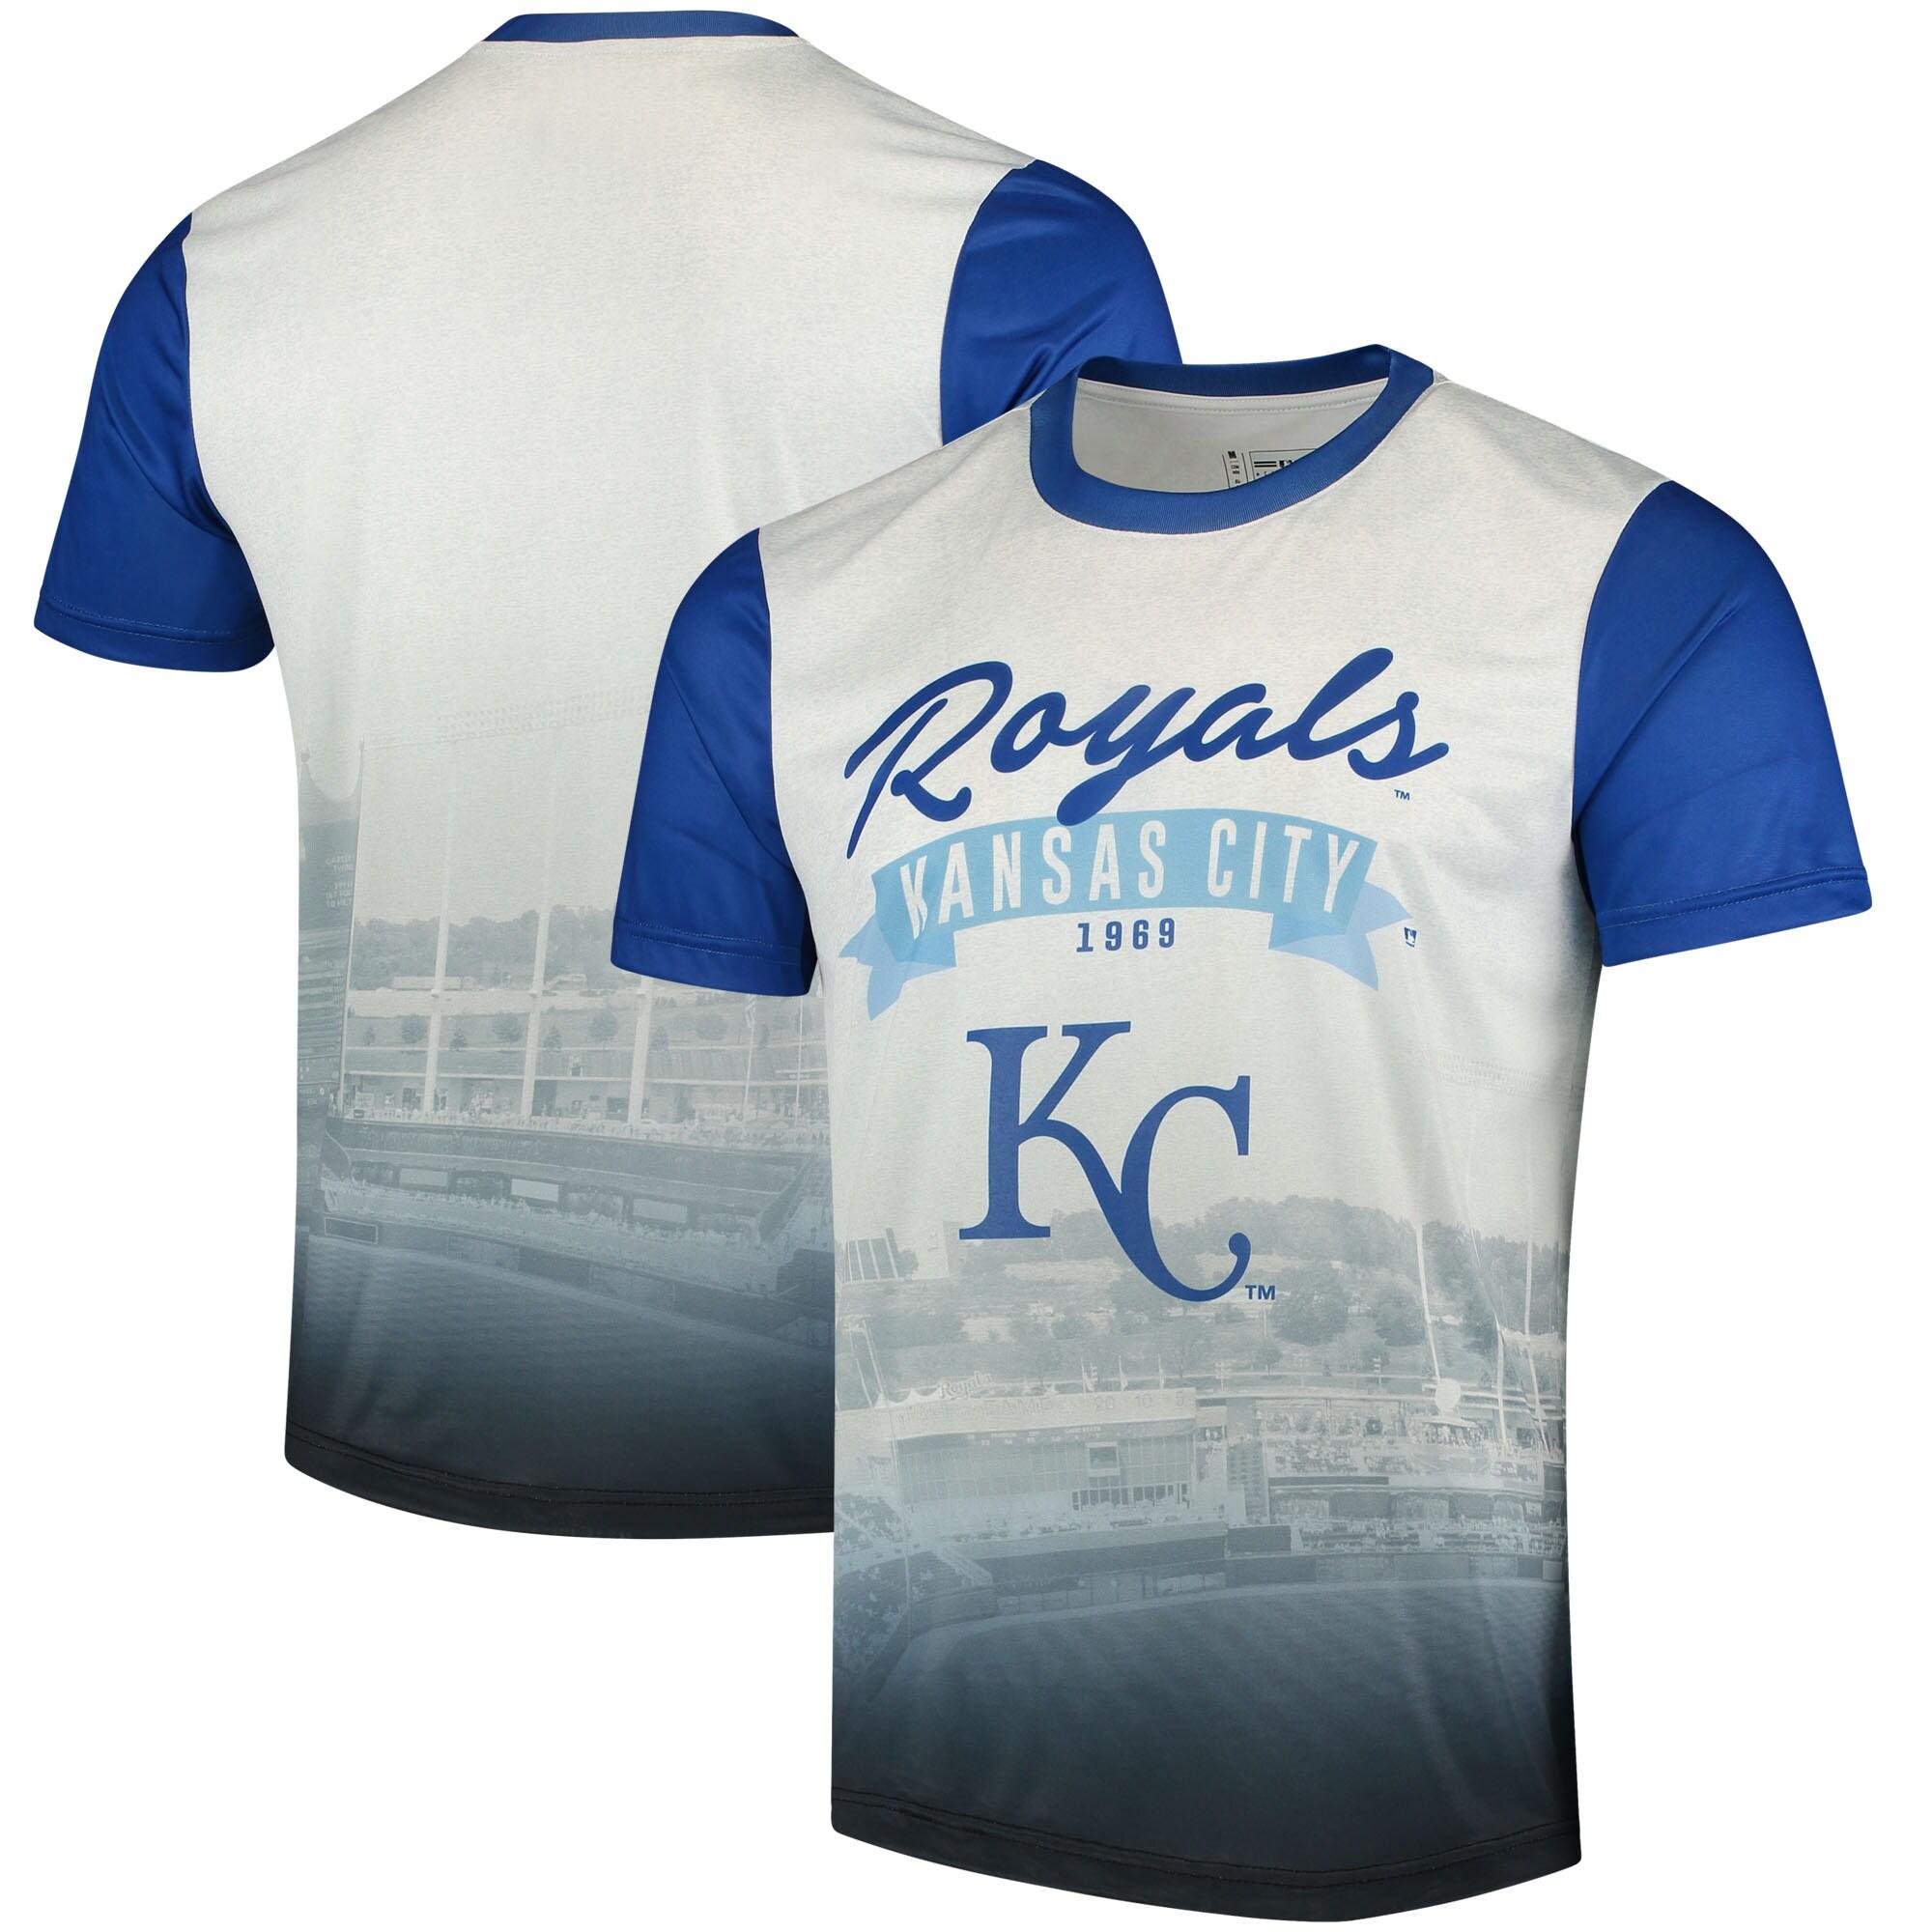 Kansas City Royals Outfield Photo T-Shirt - White/Royal